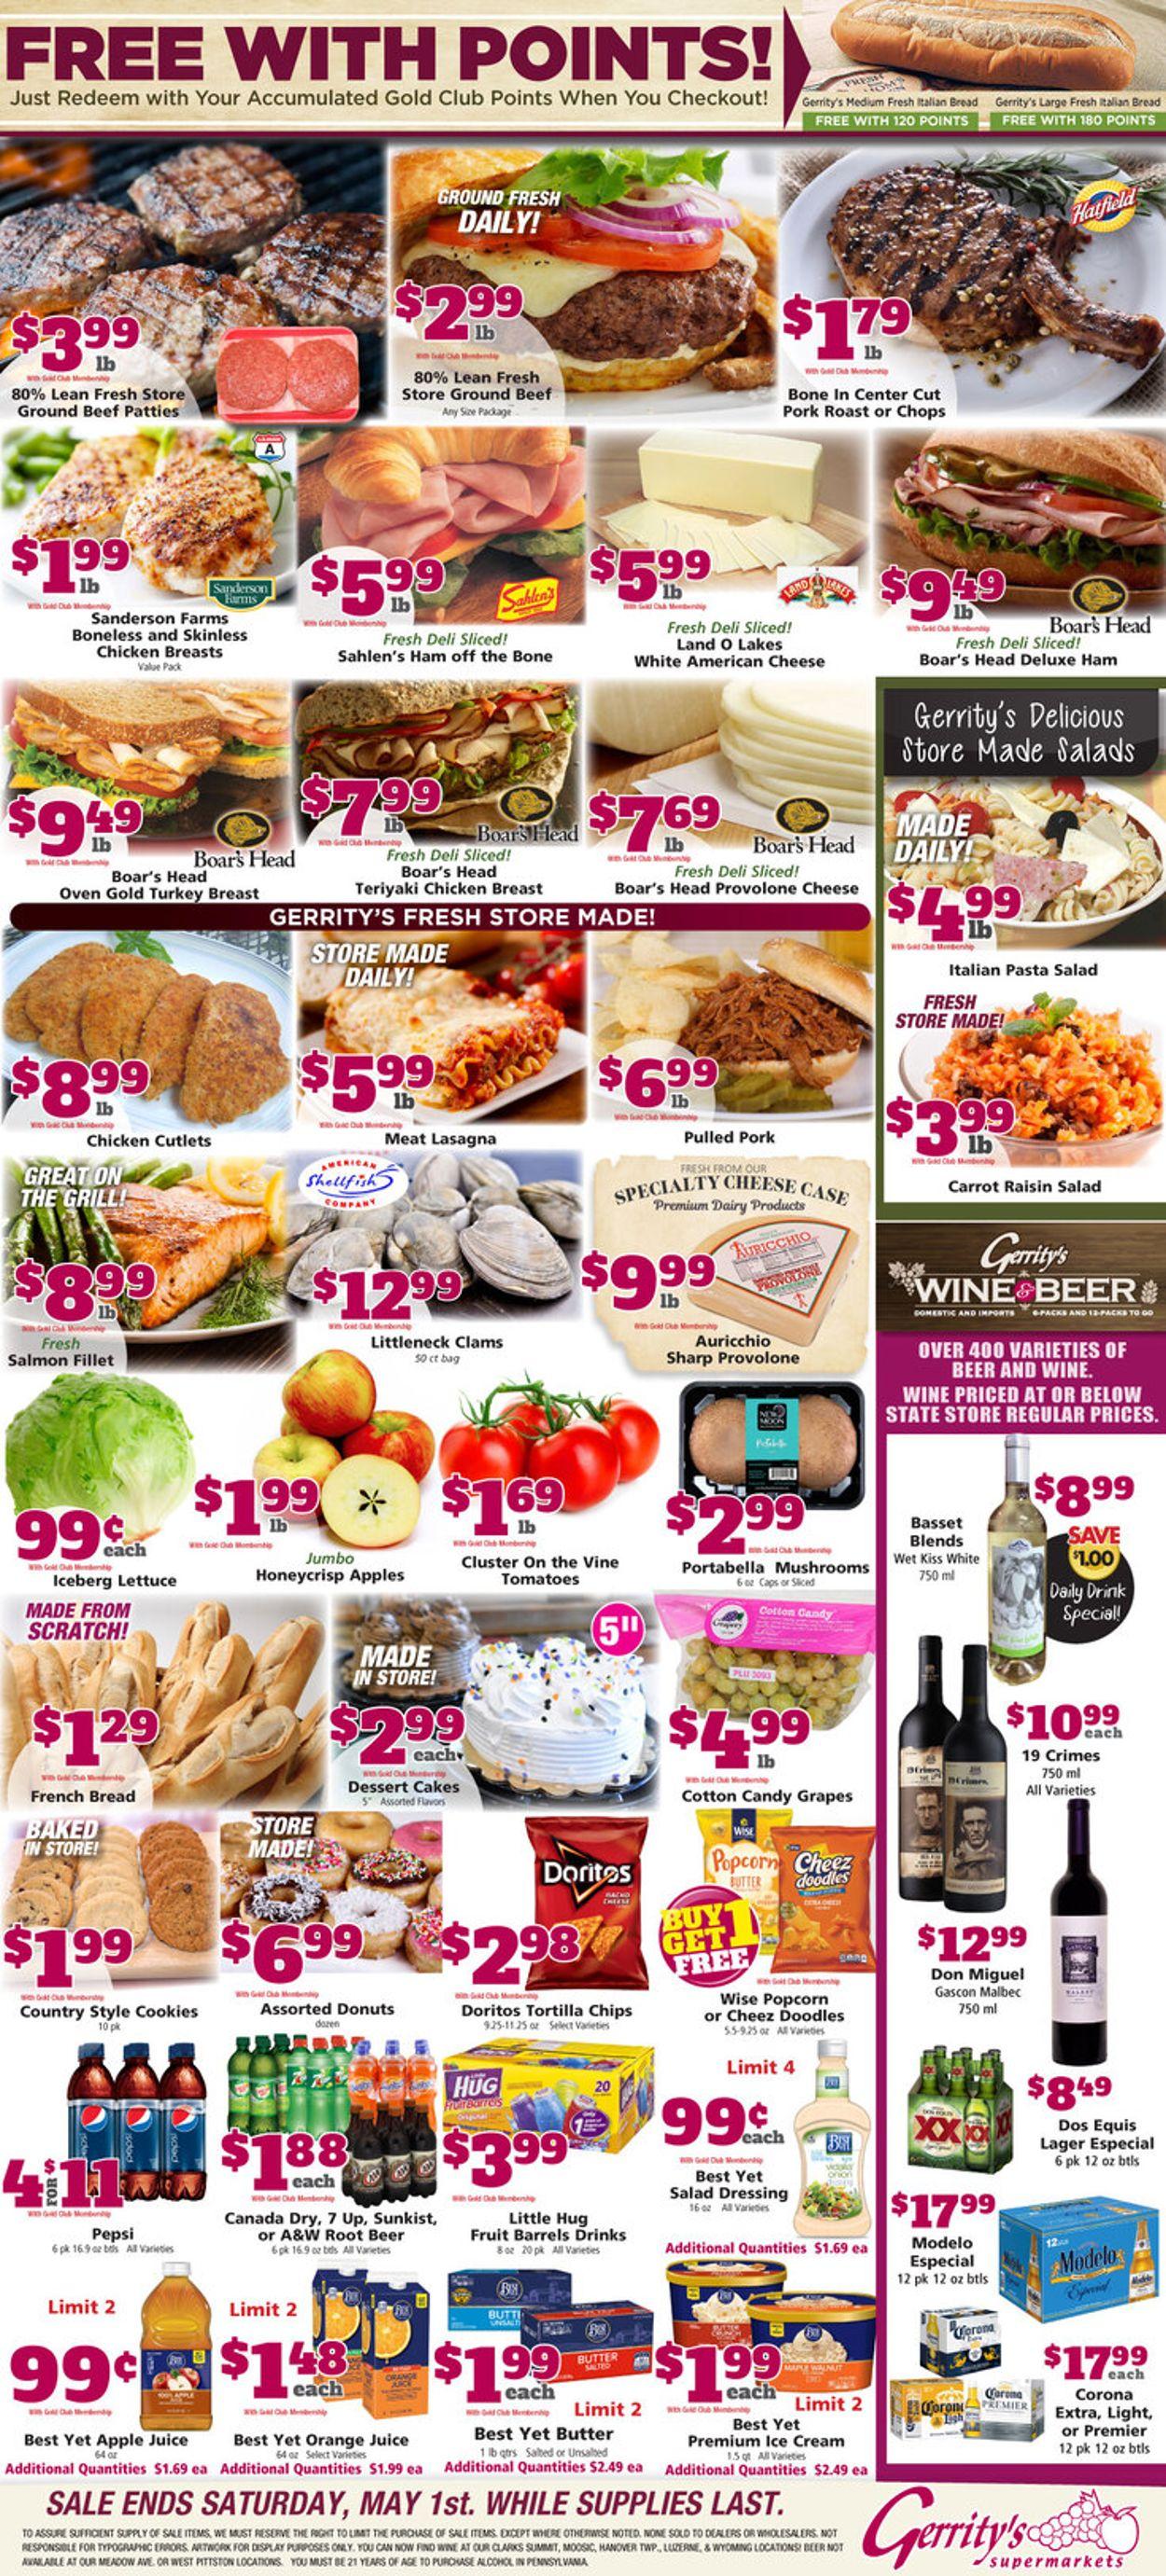 Gerrity's Supermarkets Weekly Ad Circular - valid 04/25-05/01/2021